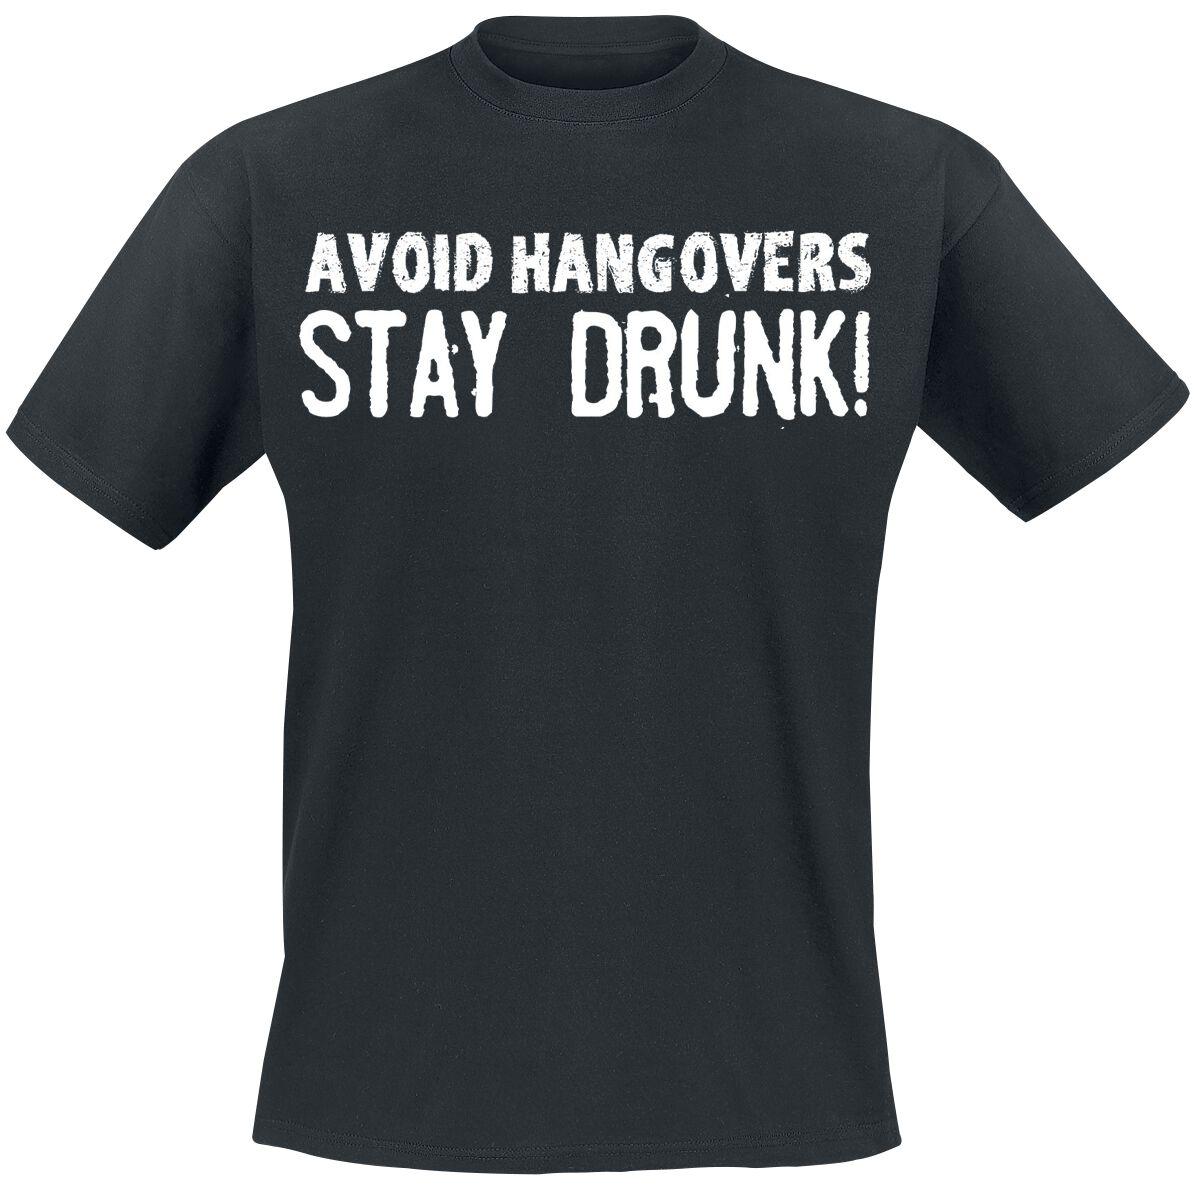 Fun Shirts - Koszulki - T-Shirt Avoid Hangovers T-Shirt czarny - 361935